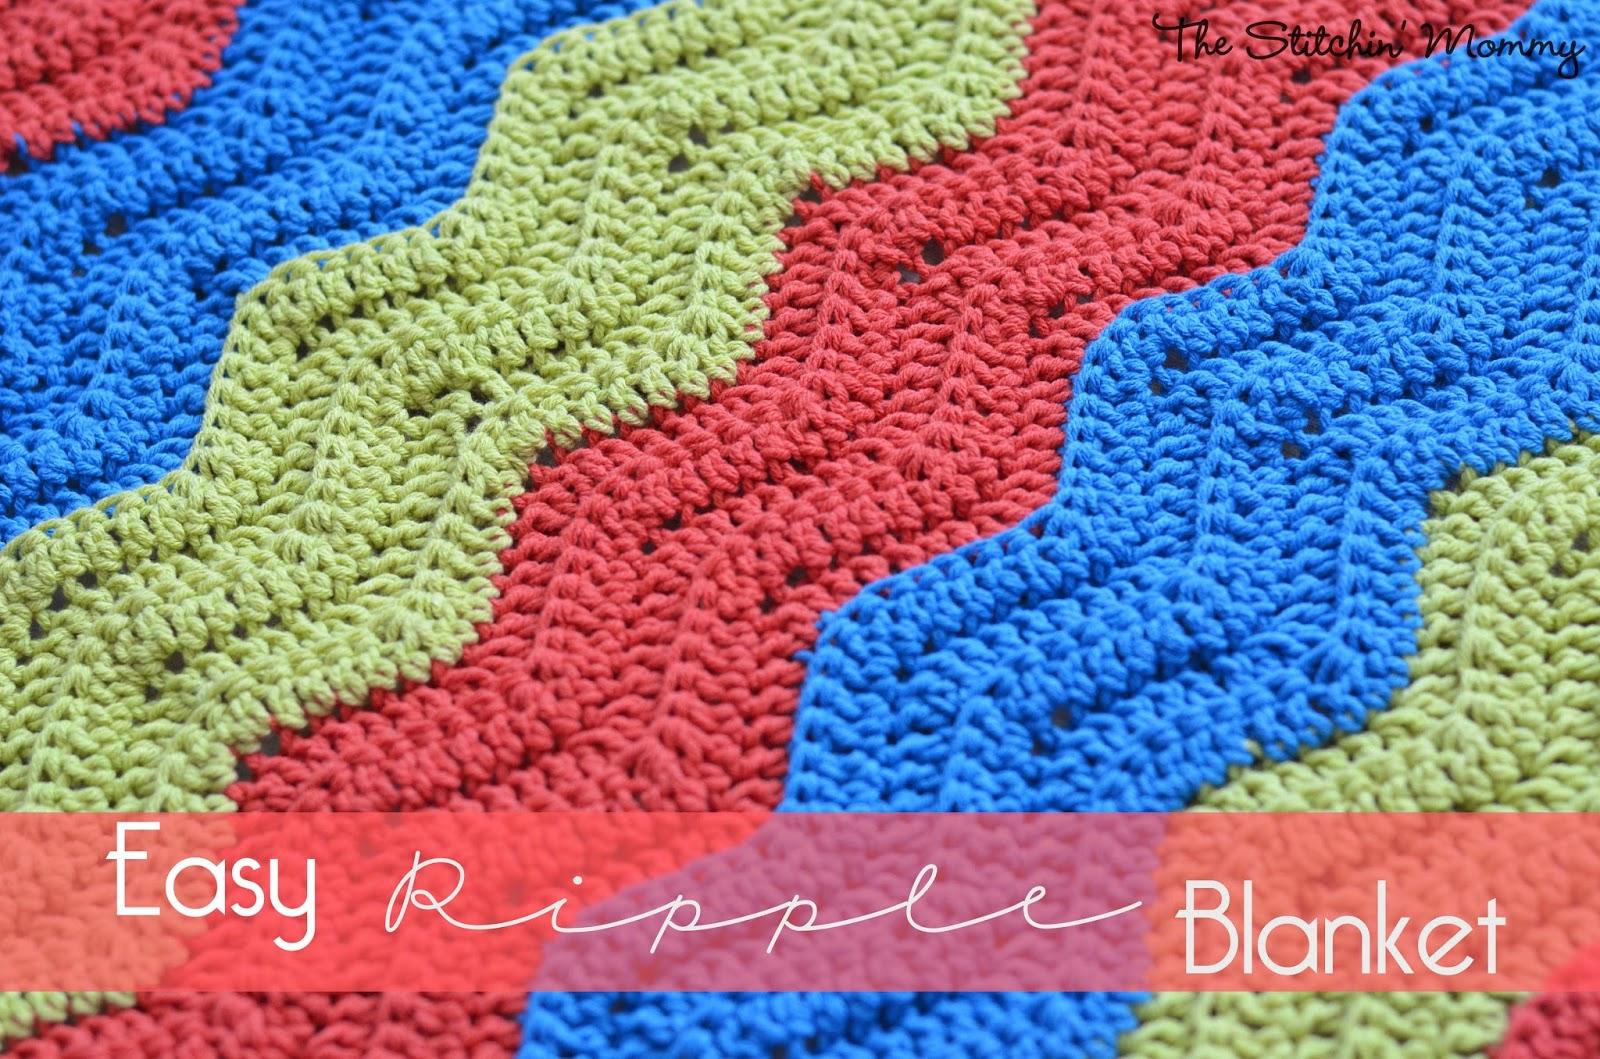 Easy Crochet Ripple Blanket - Free Crochet Pattern | www.thestitchinmommy.com